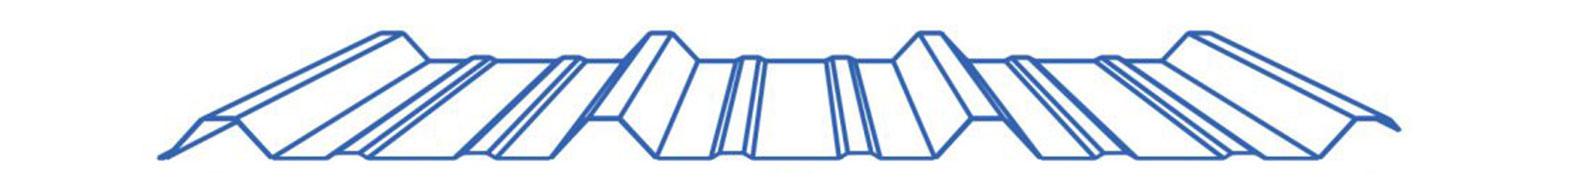 Polycarbonate - FR Panel Panel